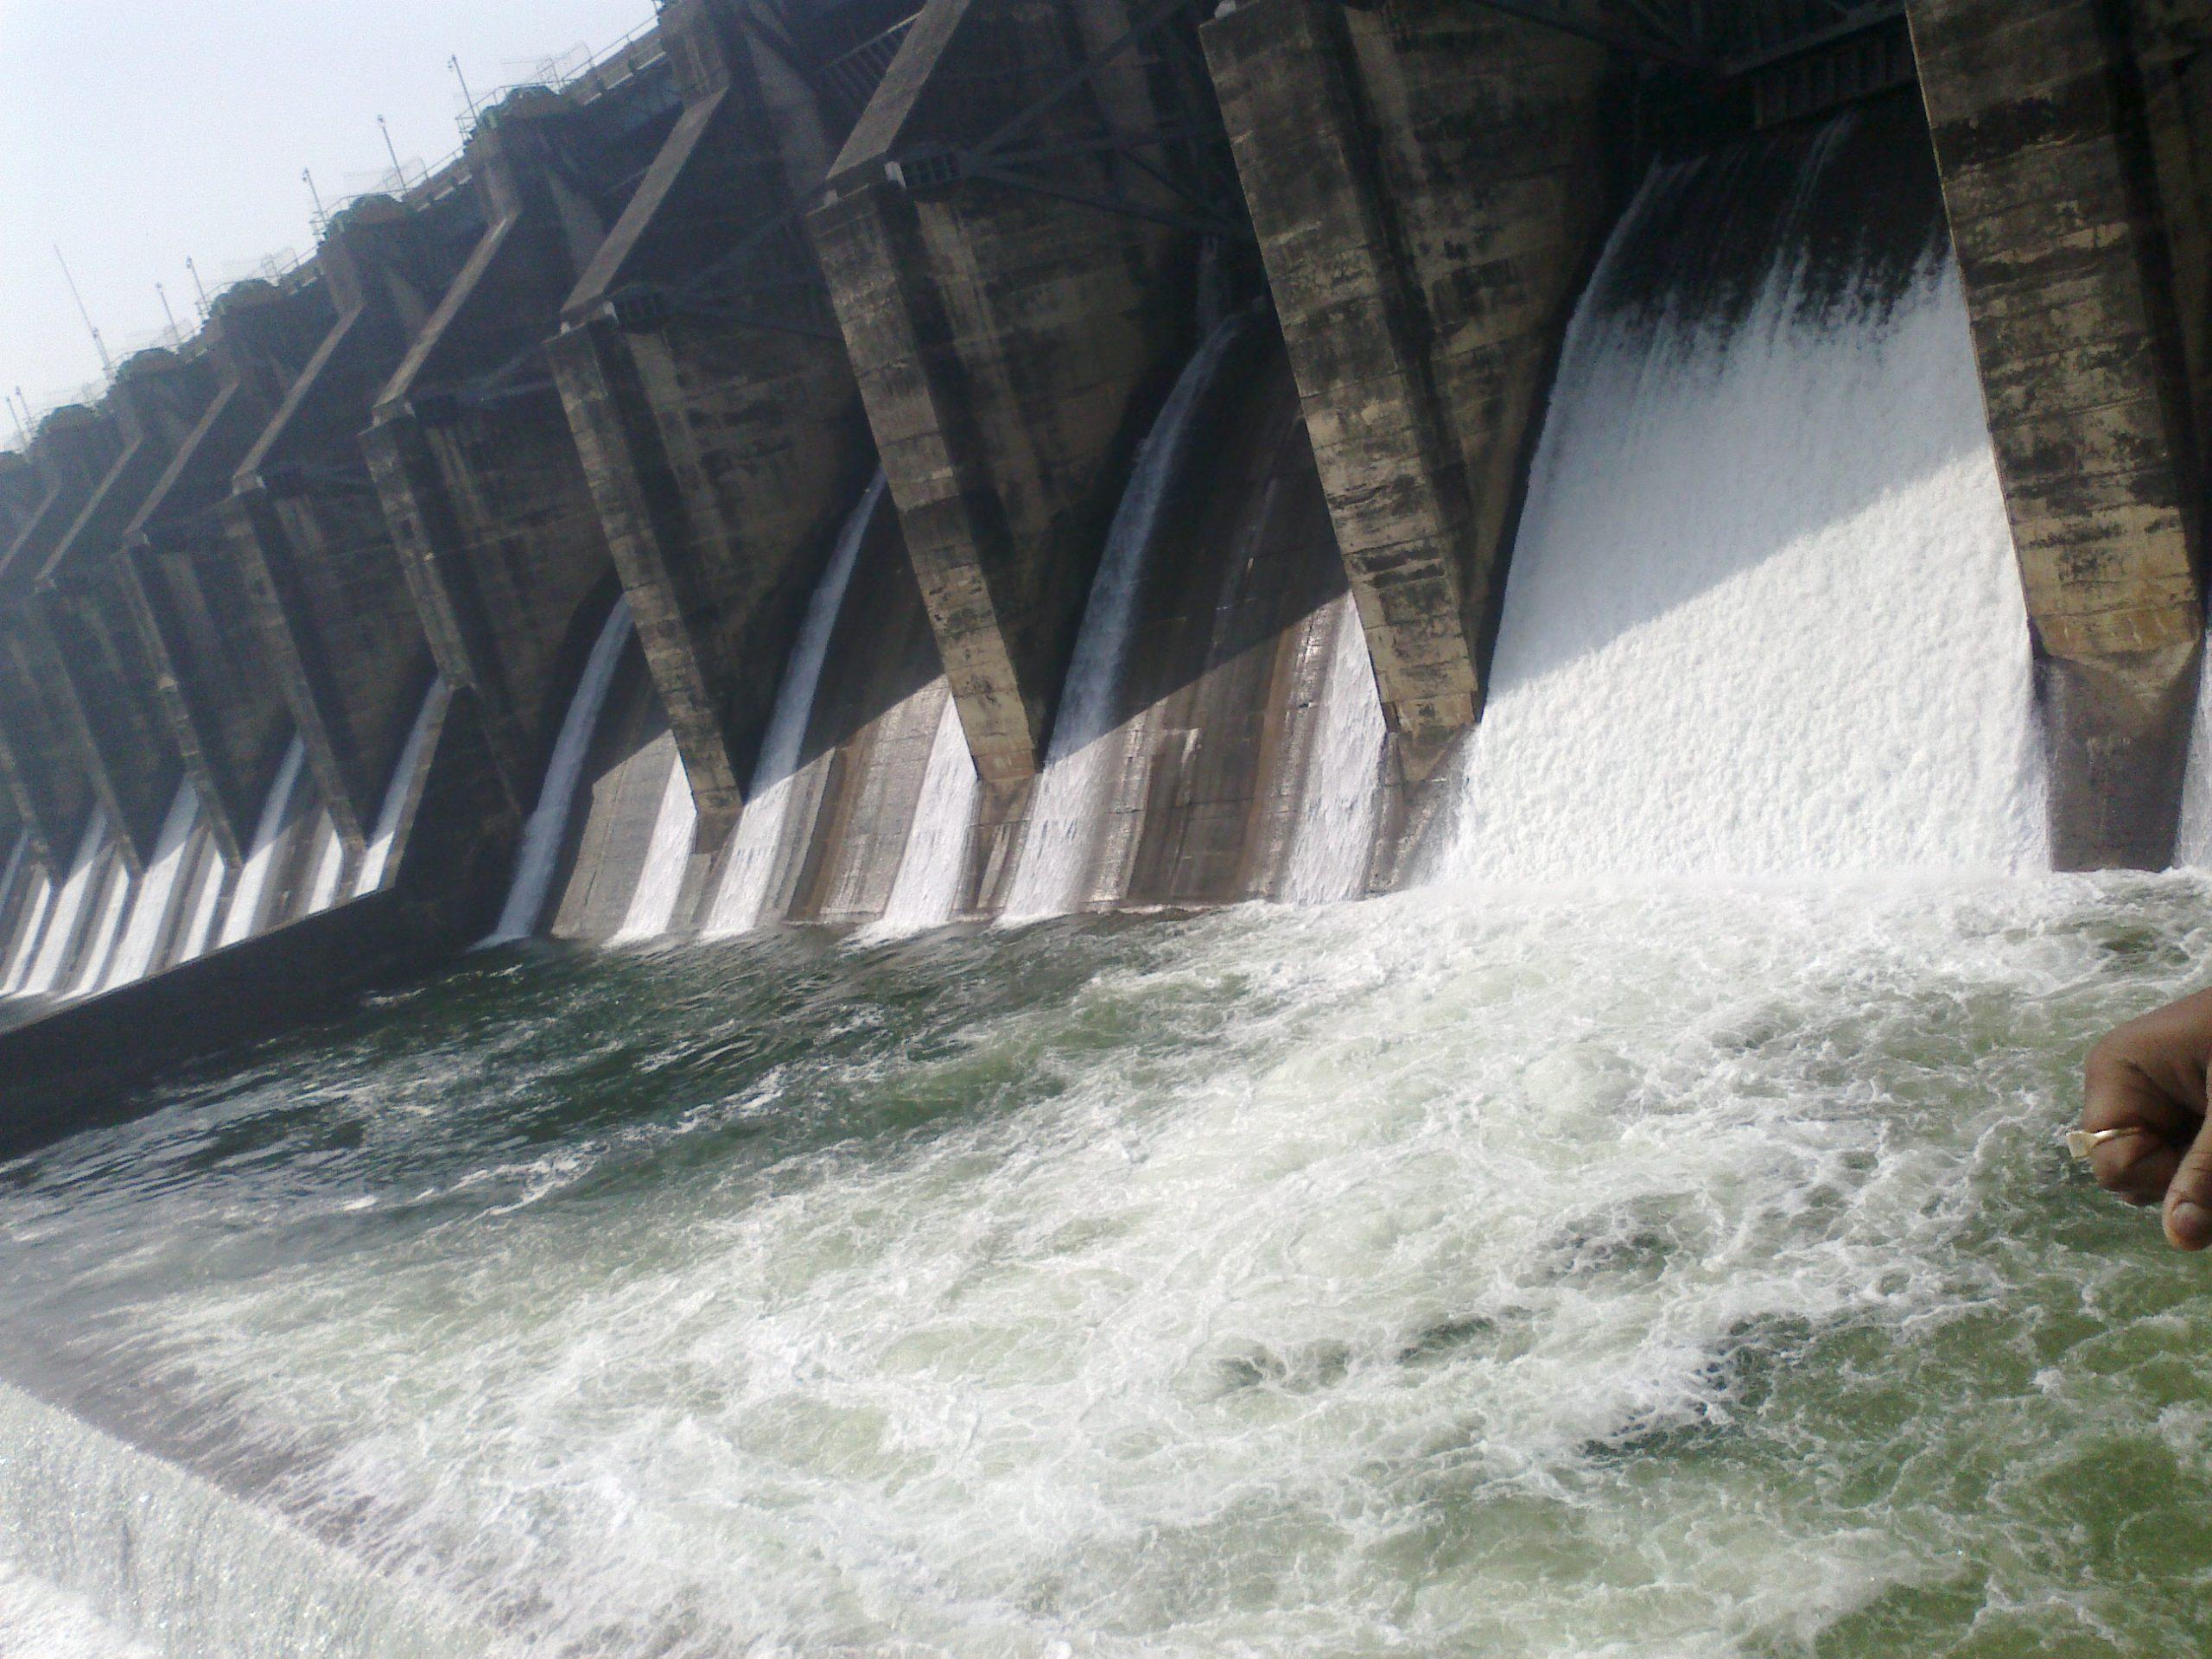 Top-rated Tourist Destination in South Bengal-Panchkot Dam